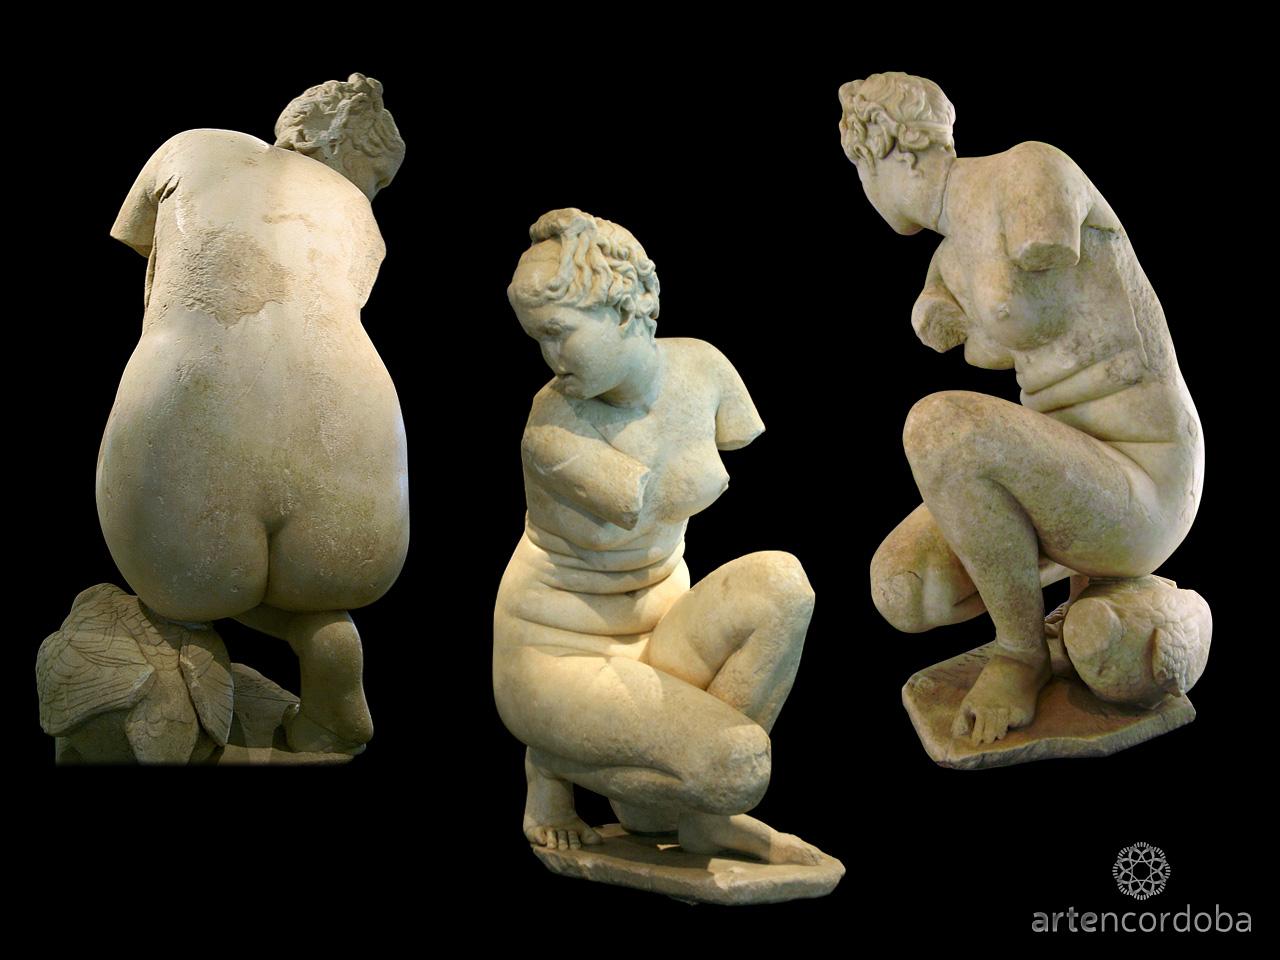 Afrodita agachada del Museo Arqueológico de Córdoba